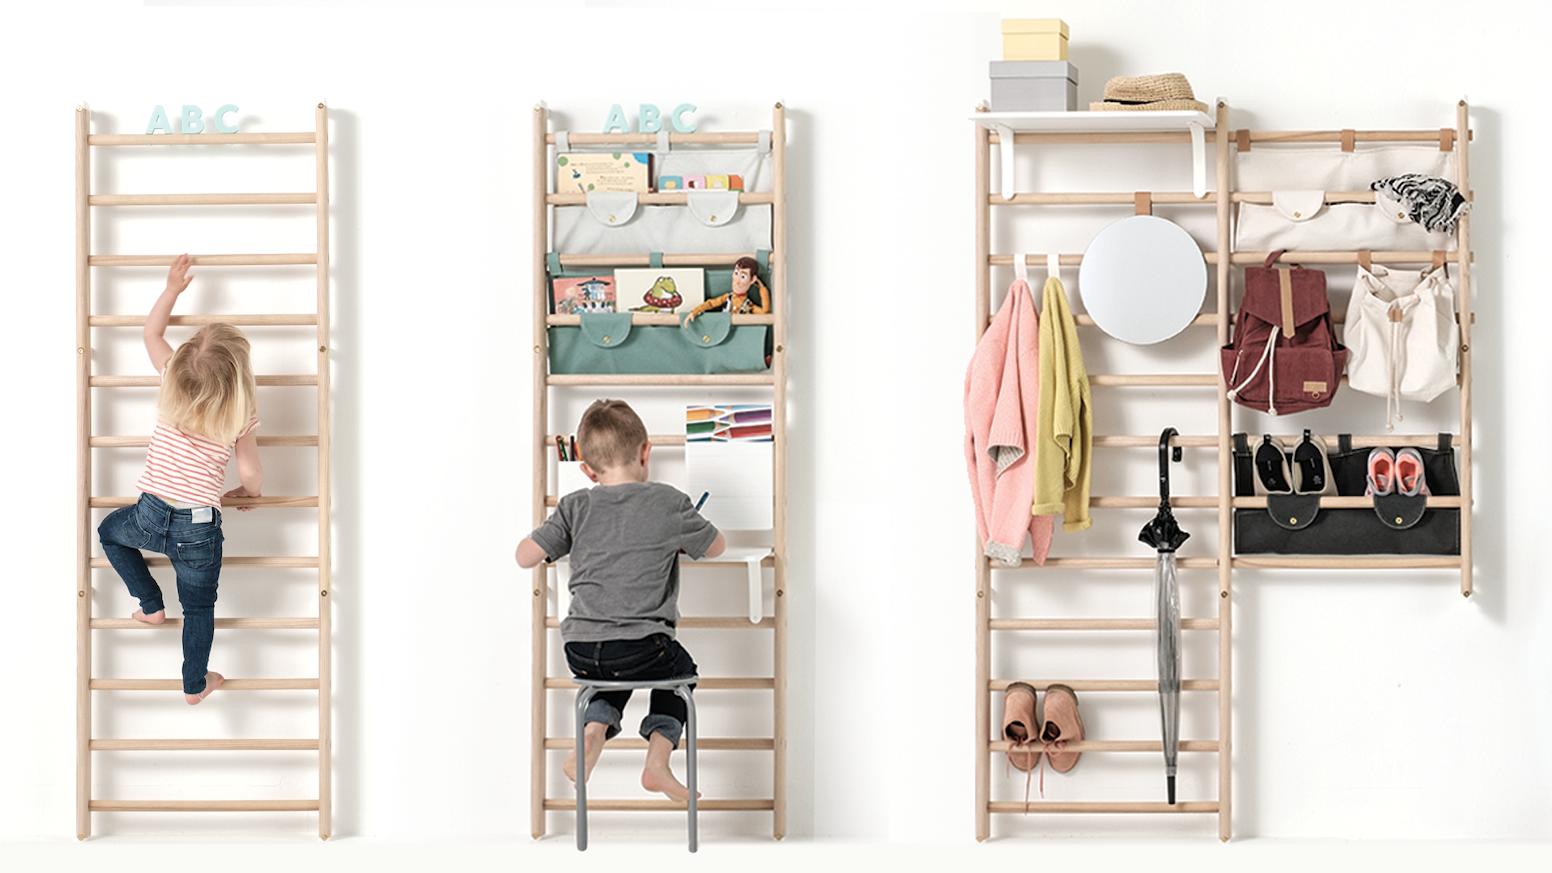 Ingenious wall bars - Scandinavian design by KAOS — Kickstarter